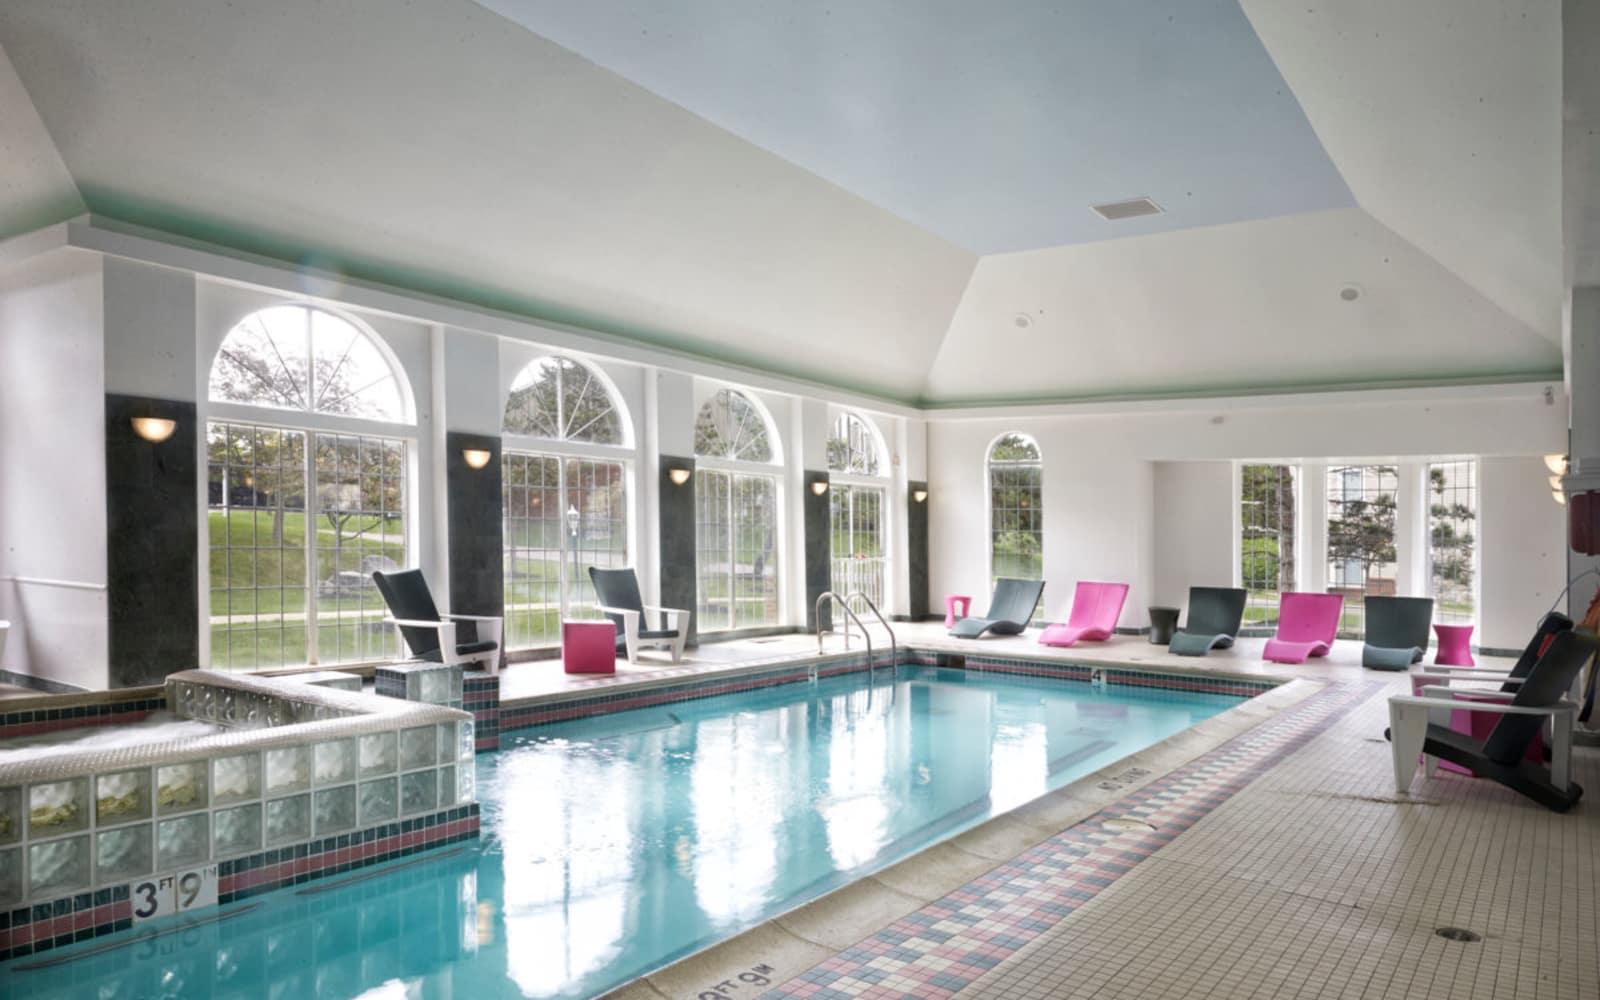 Indoor pool at Citation Club in Farmington Hills, Michigan